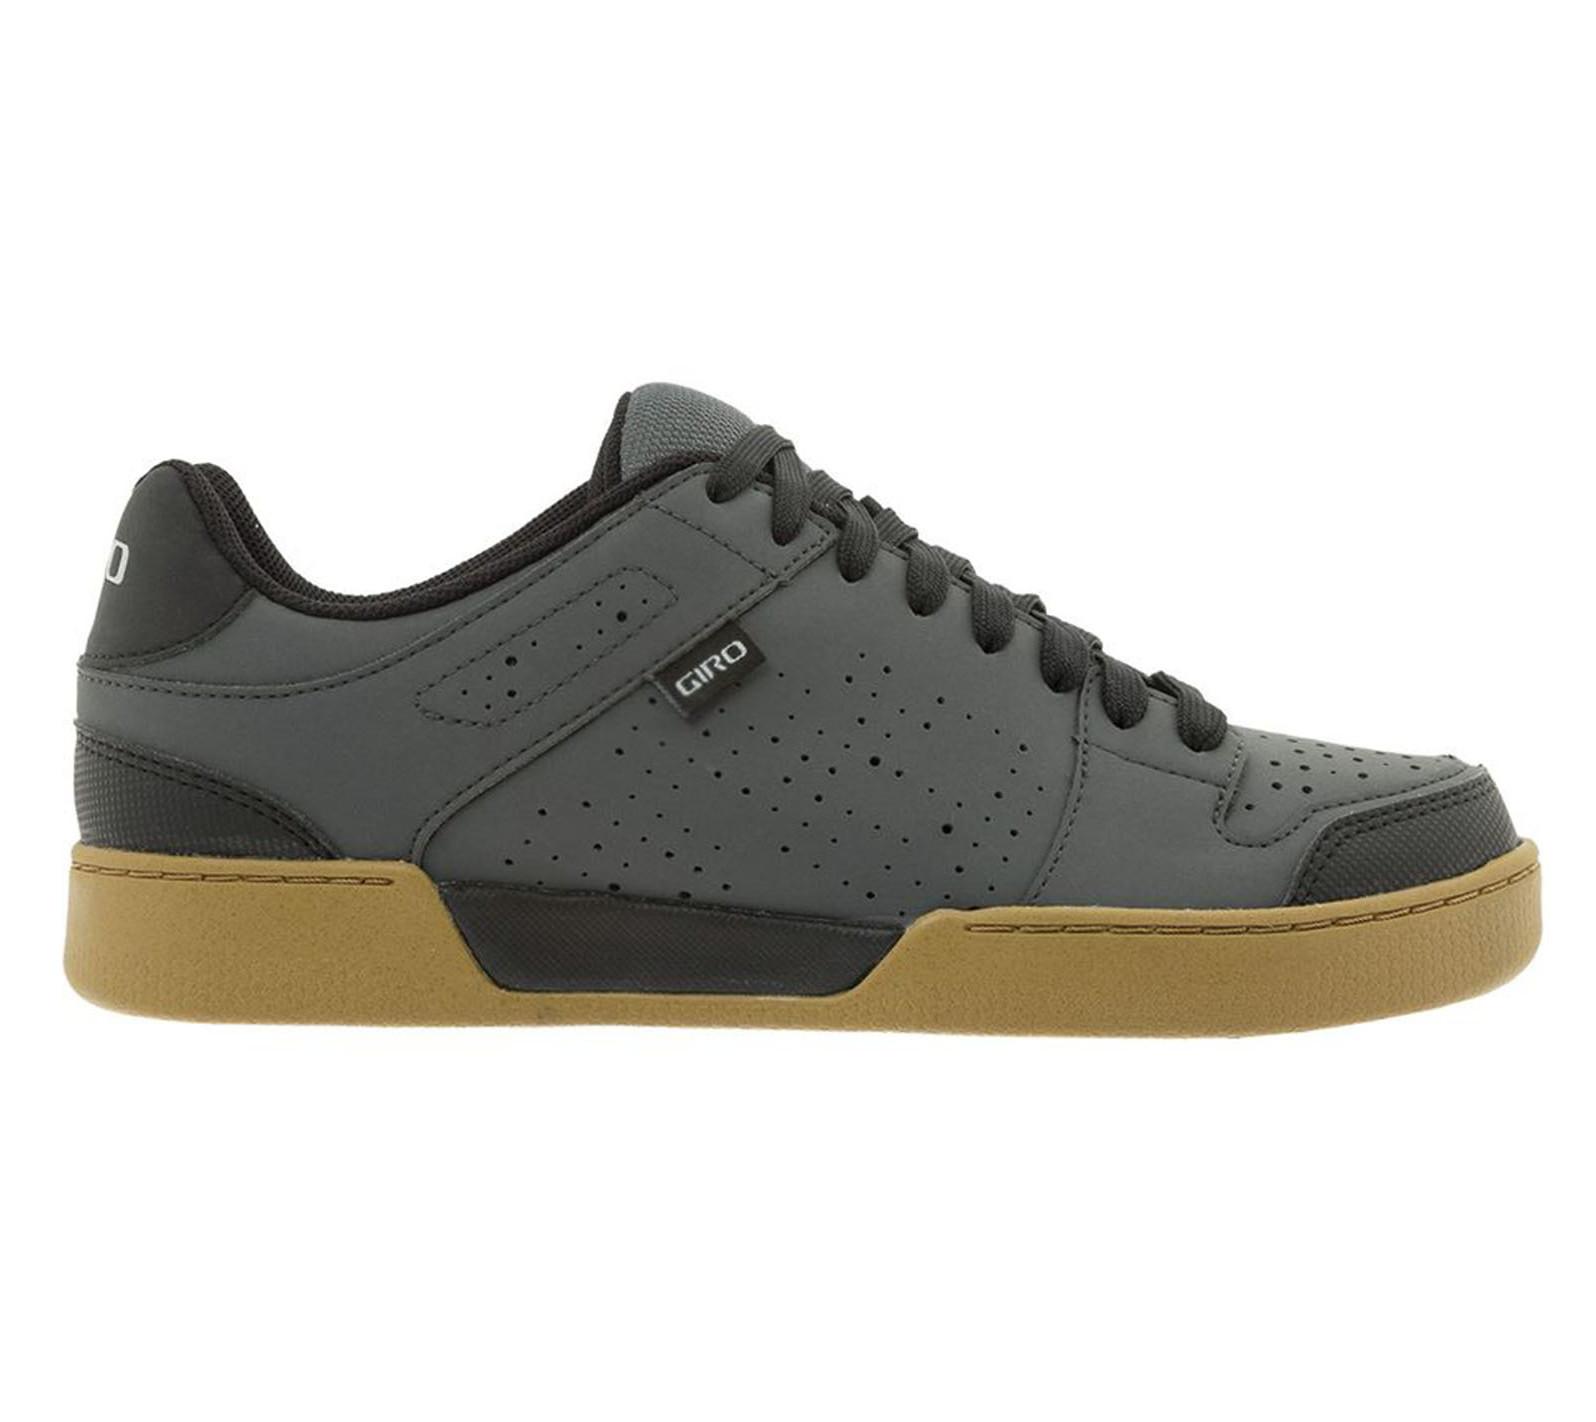 Giro Jacket II shoe in dark shadow-gum